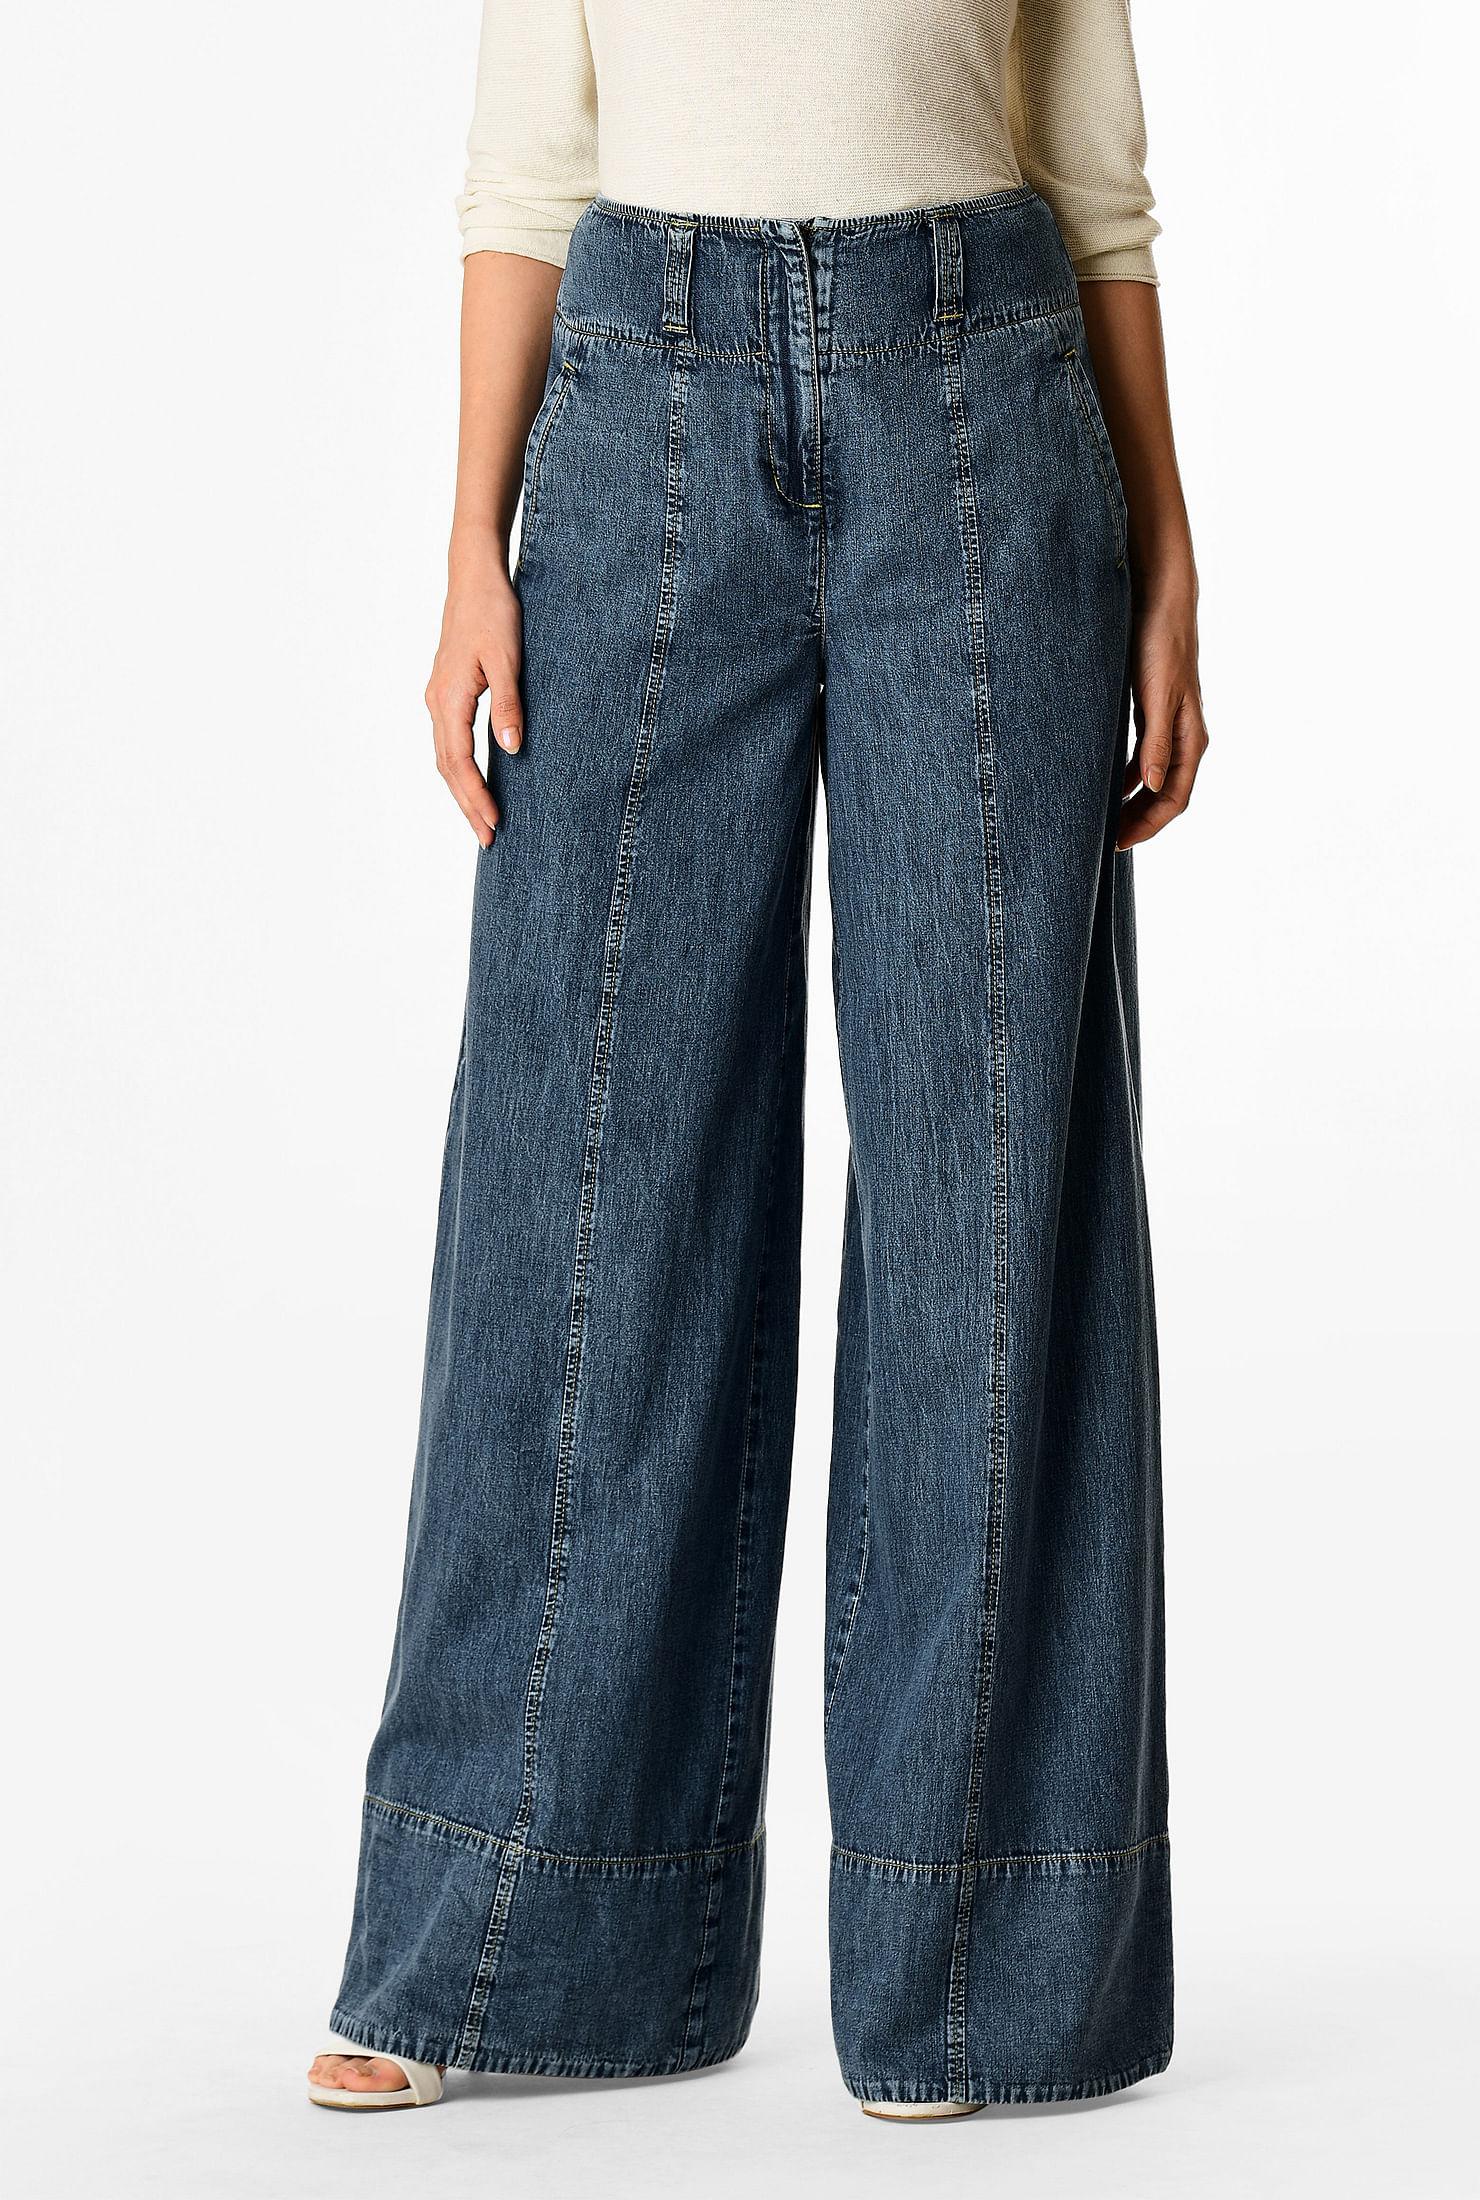 vintage teal blue coulottes palazzo pockets capri pants *568